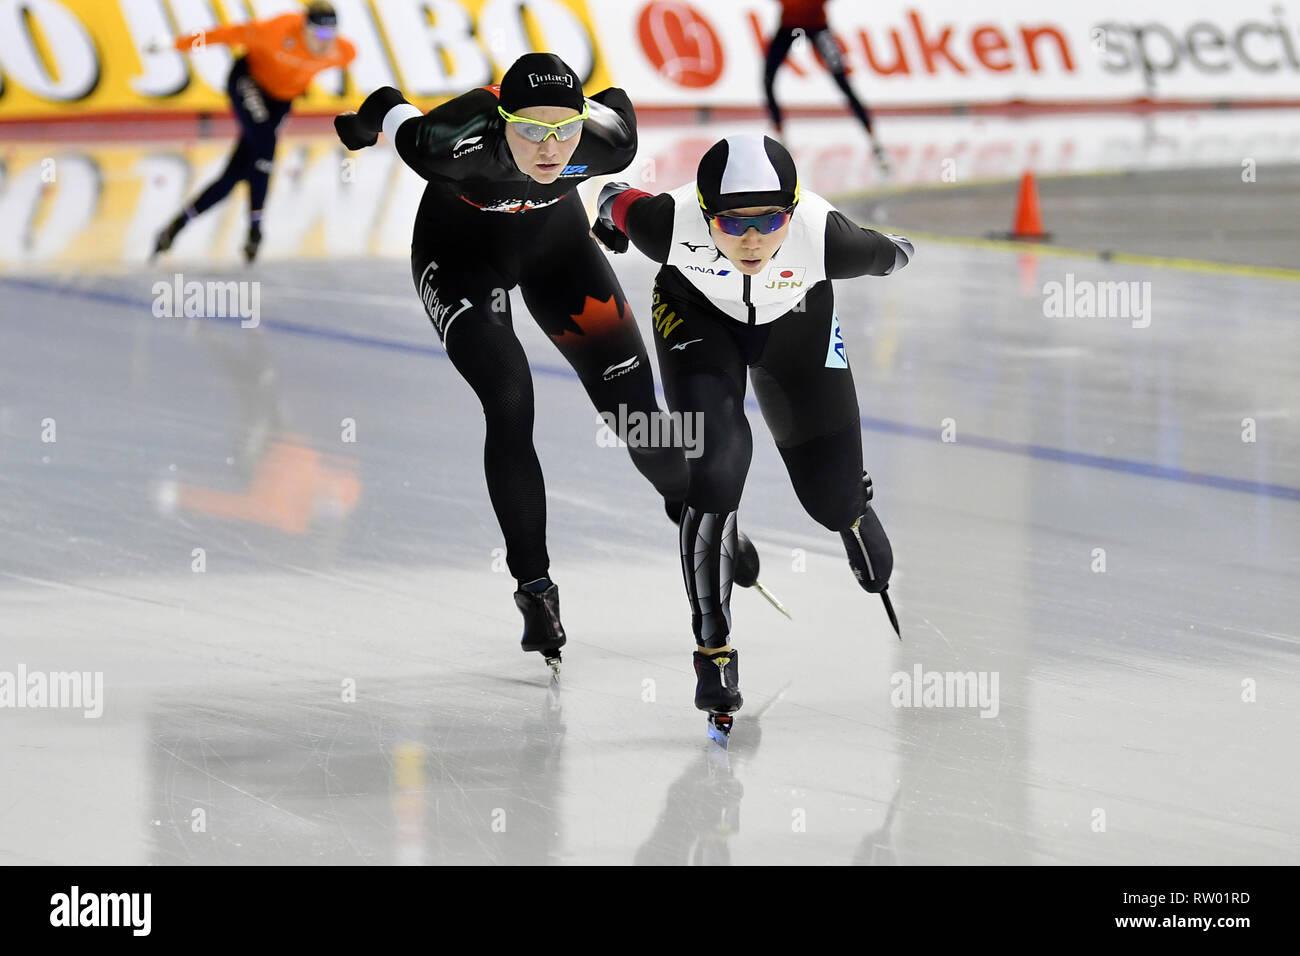 Speed Skating ISU World Championships Allround 2019 on March 2 2019 a the Olympics Oval in Calgary, Canada. Miho Takagi (JPN) vs Isabelle Weidemann Credit: Huub Snoep/SCS/AFLO/Alamy Live News - Stock Image